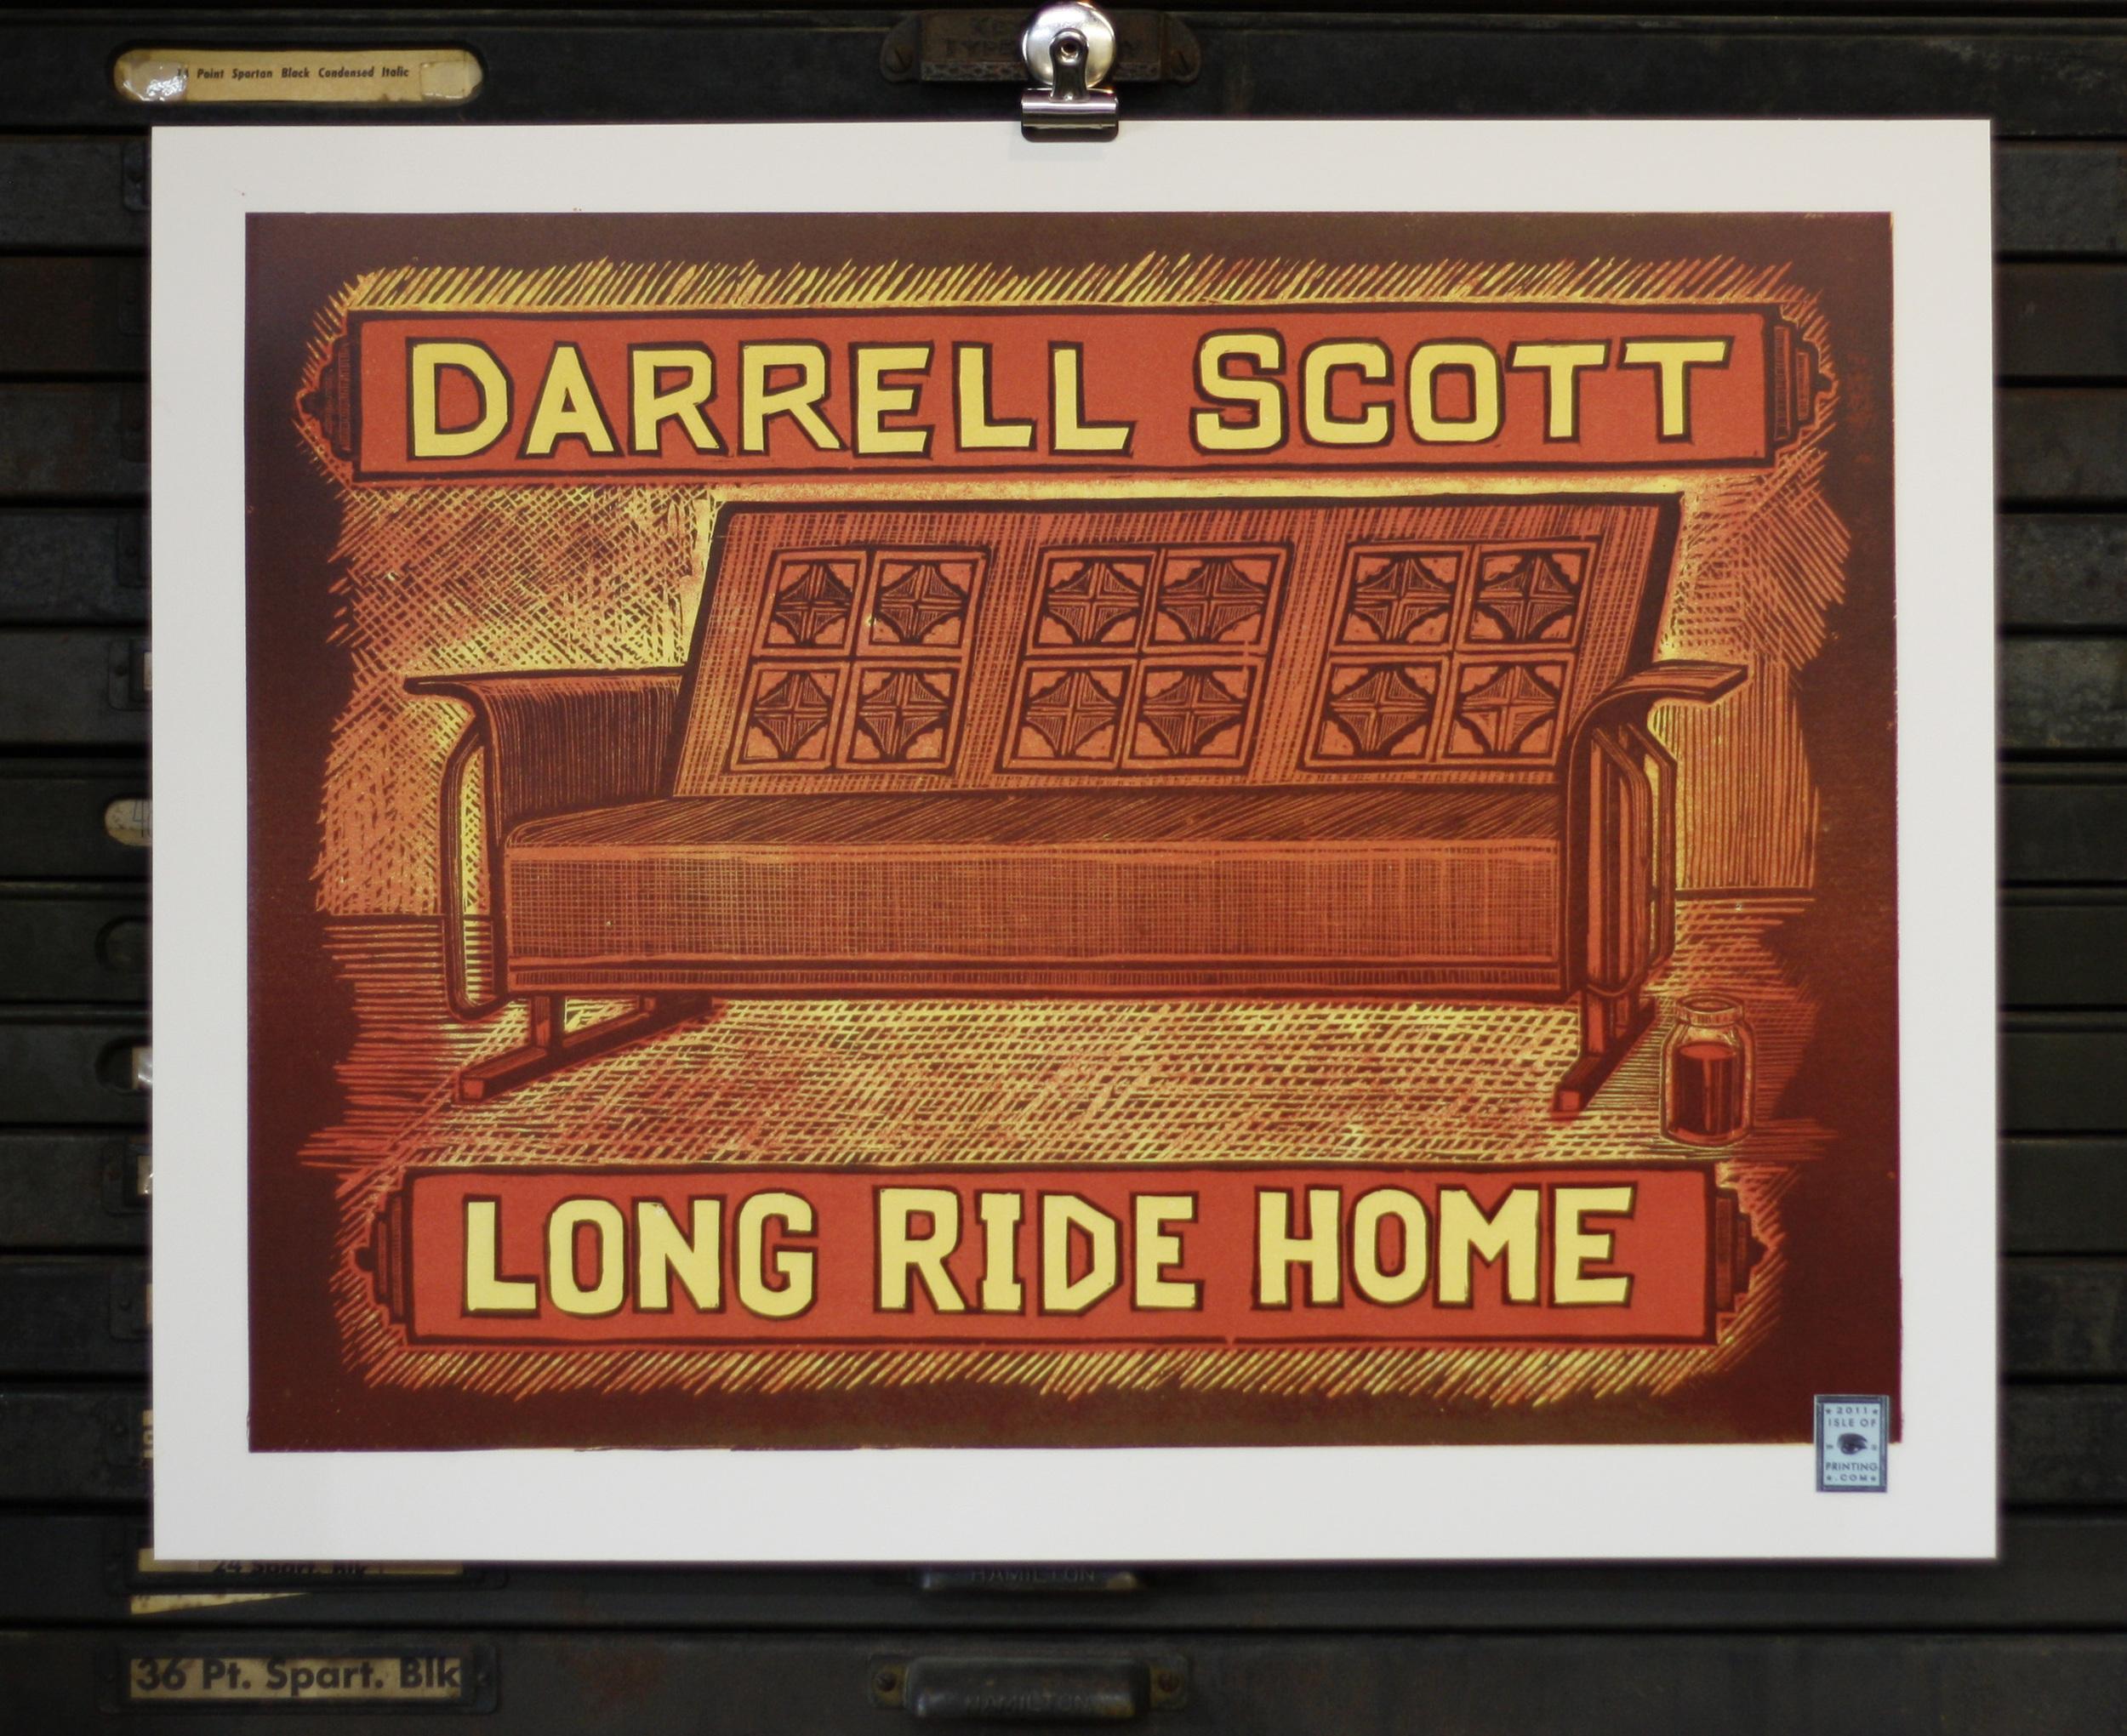 darrell-scott-type-fuzzy.jpg